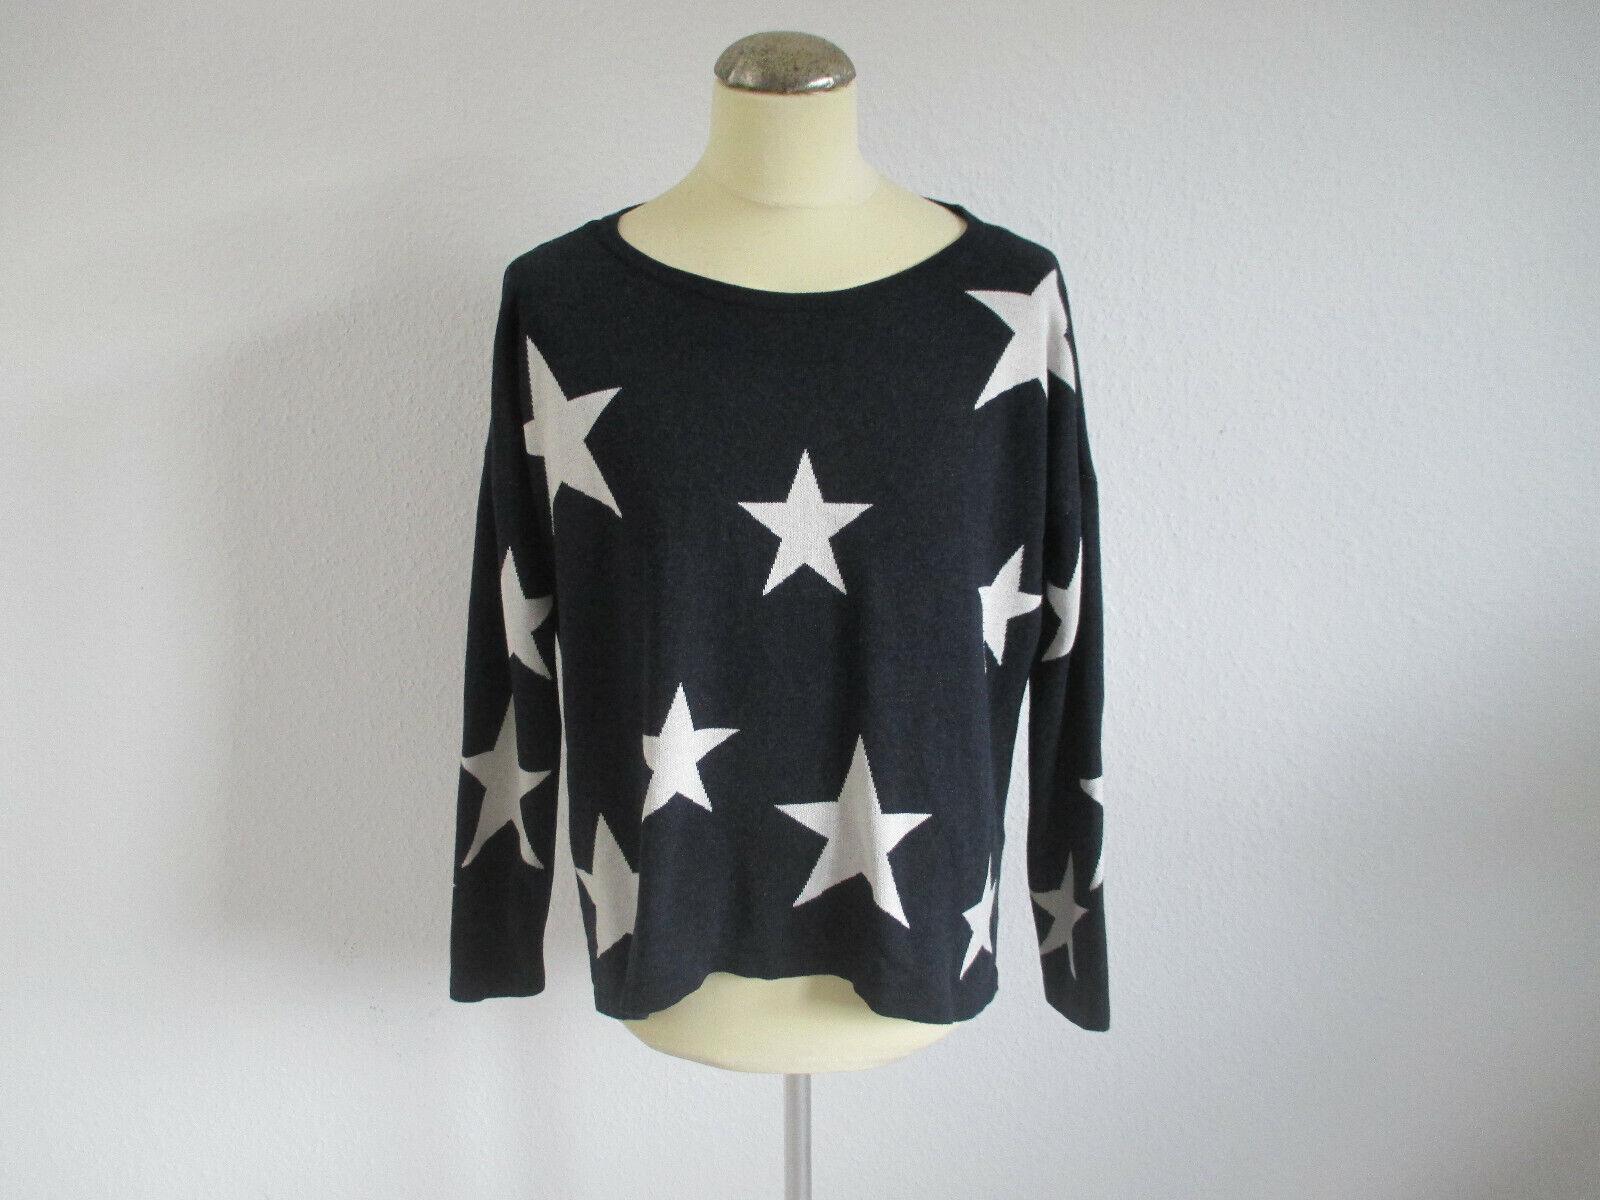 Pullover  ✮ ONLY ✮   Gr.XL  Sterne  Hinten länger  Dunkelb.-Weiß   ✮TOP Zustand✮